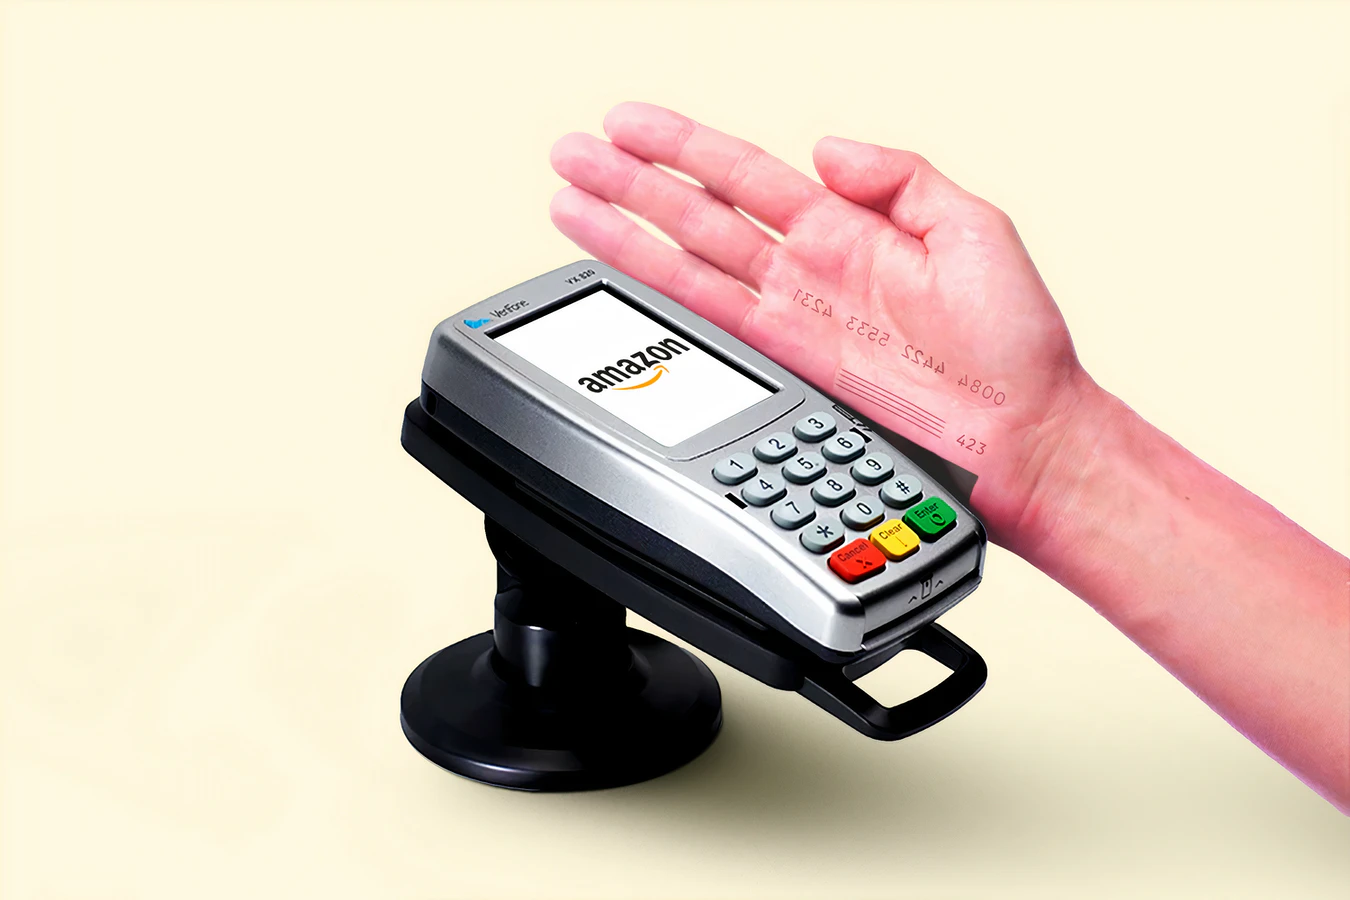 man swiping his hand on a credit card reader